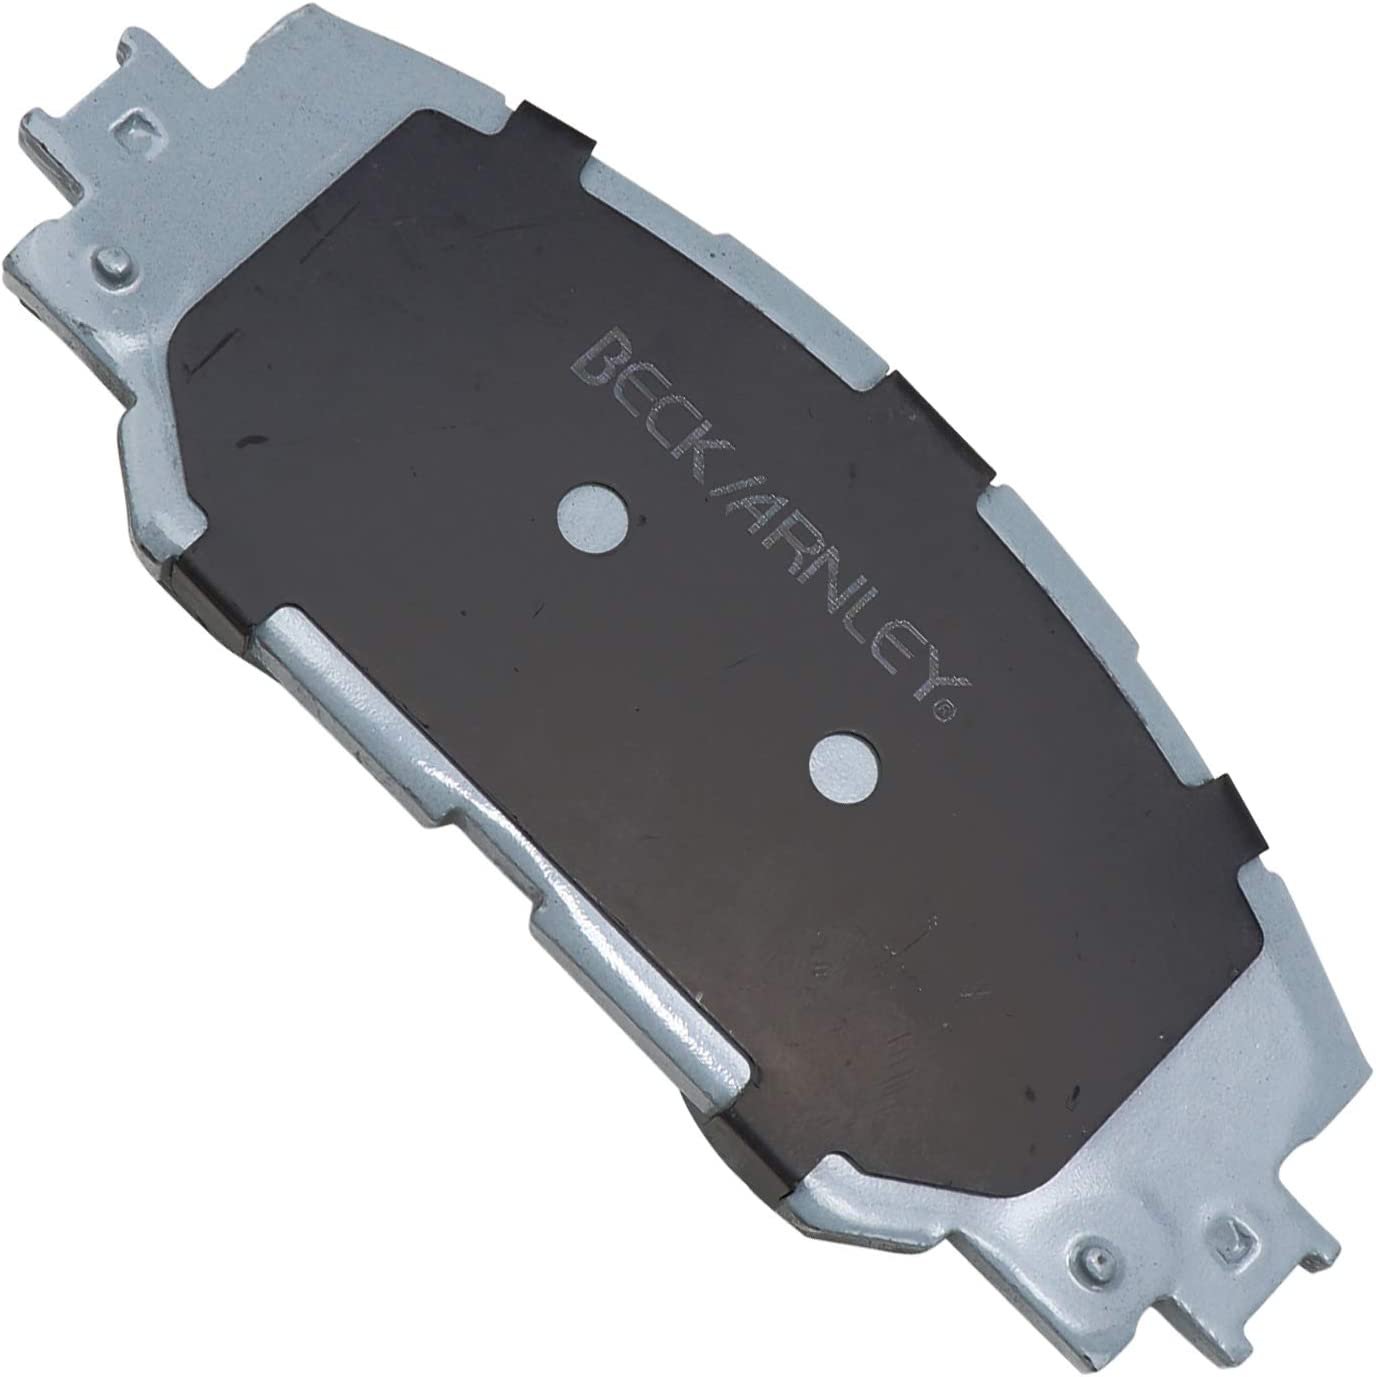 BECKARNLEY 085-6786 Premium ASM Pad with Hardware